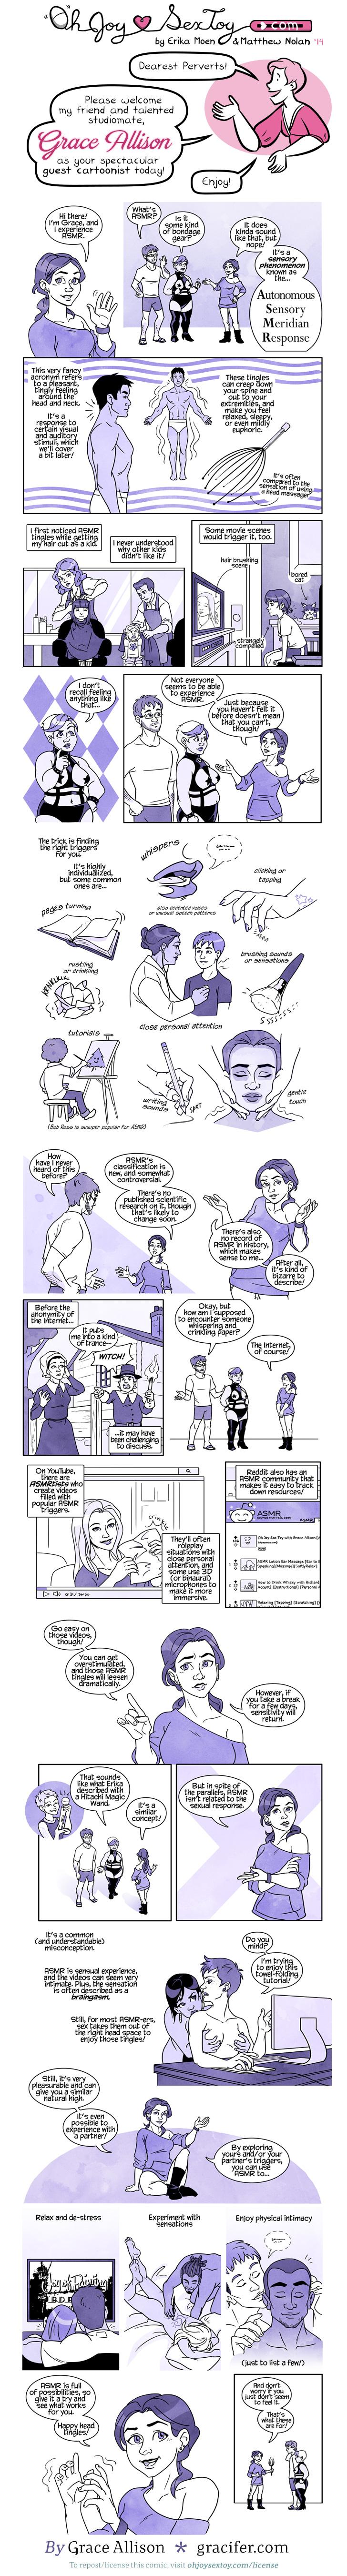 a comic details a sensory condition called ASMR